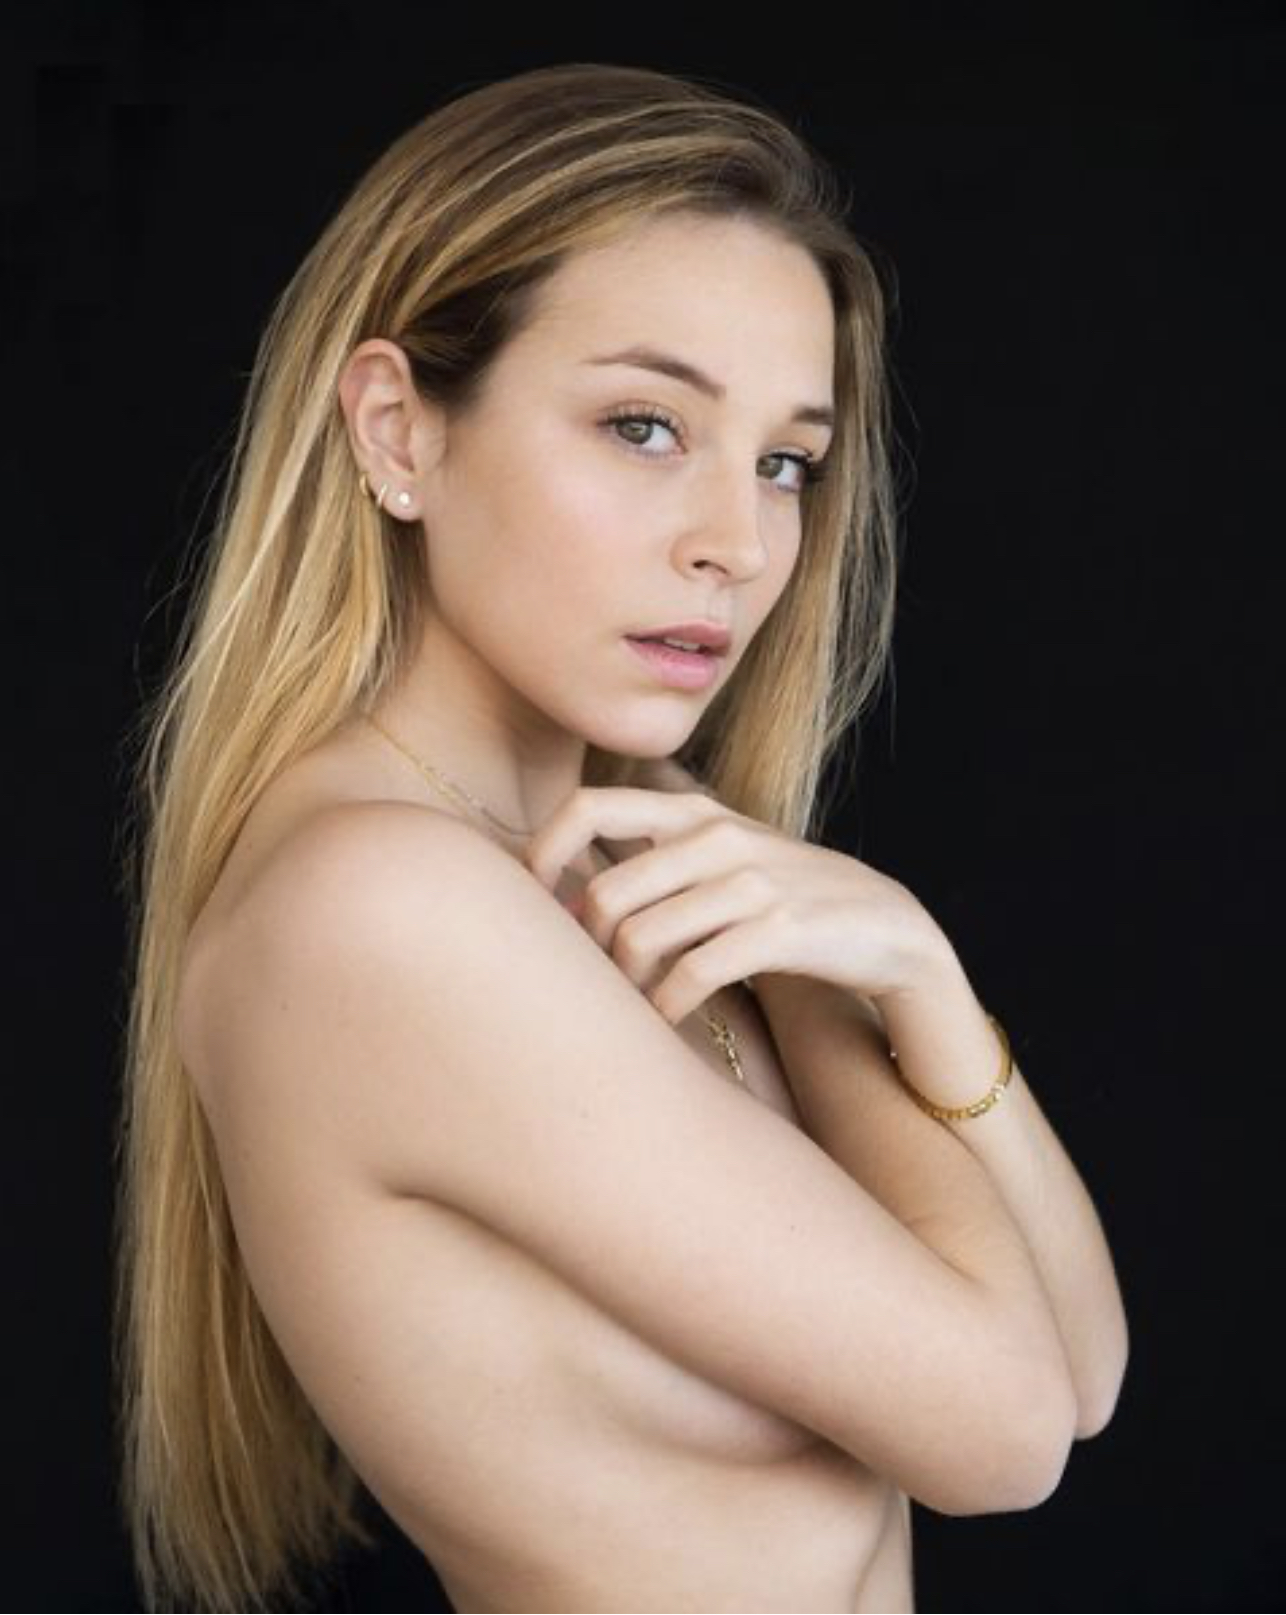 Андреа Фрейхомиль — подруга защитника «Барселоны» Оскара Мингеса